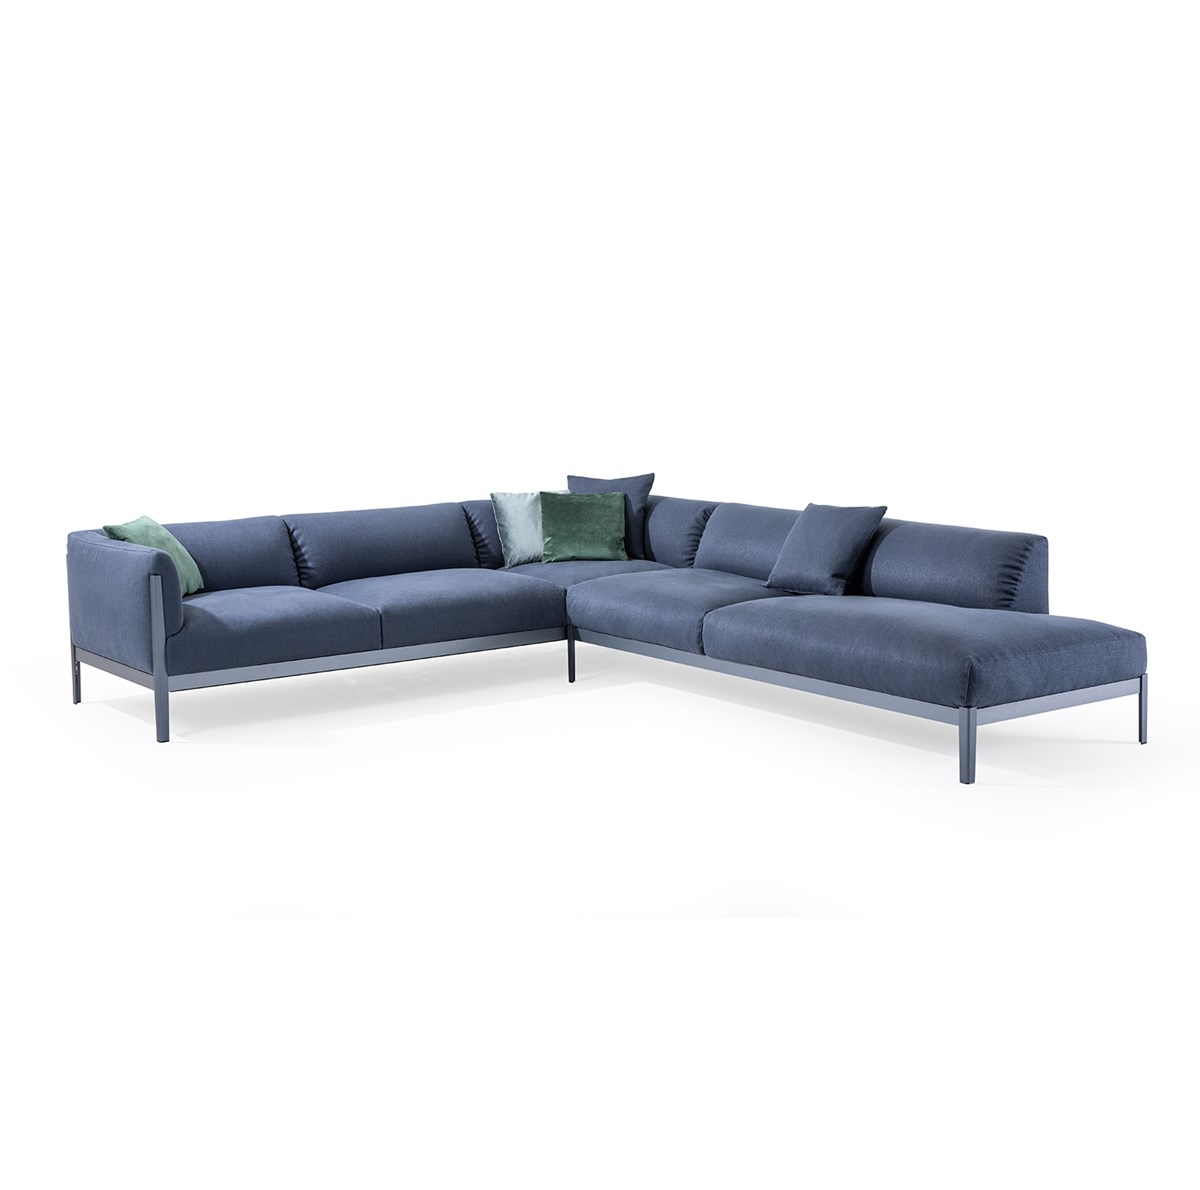 Cassina-Ronan-Erwan-Bouroullec-Cotone-Sofa-Matisse-1